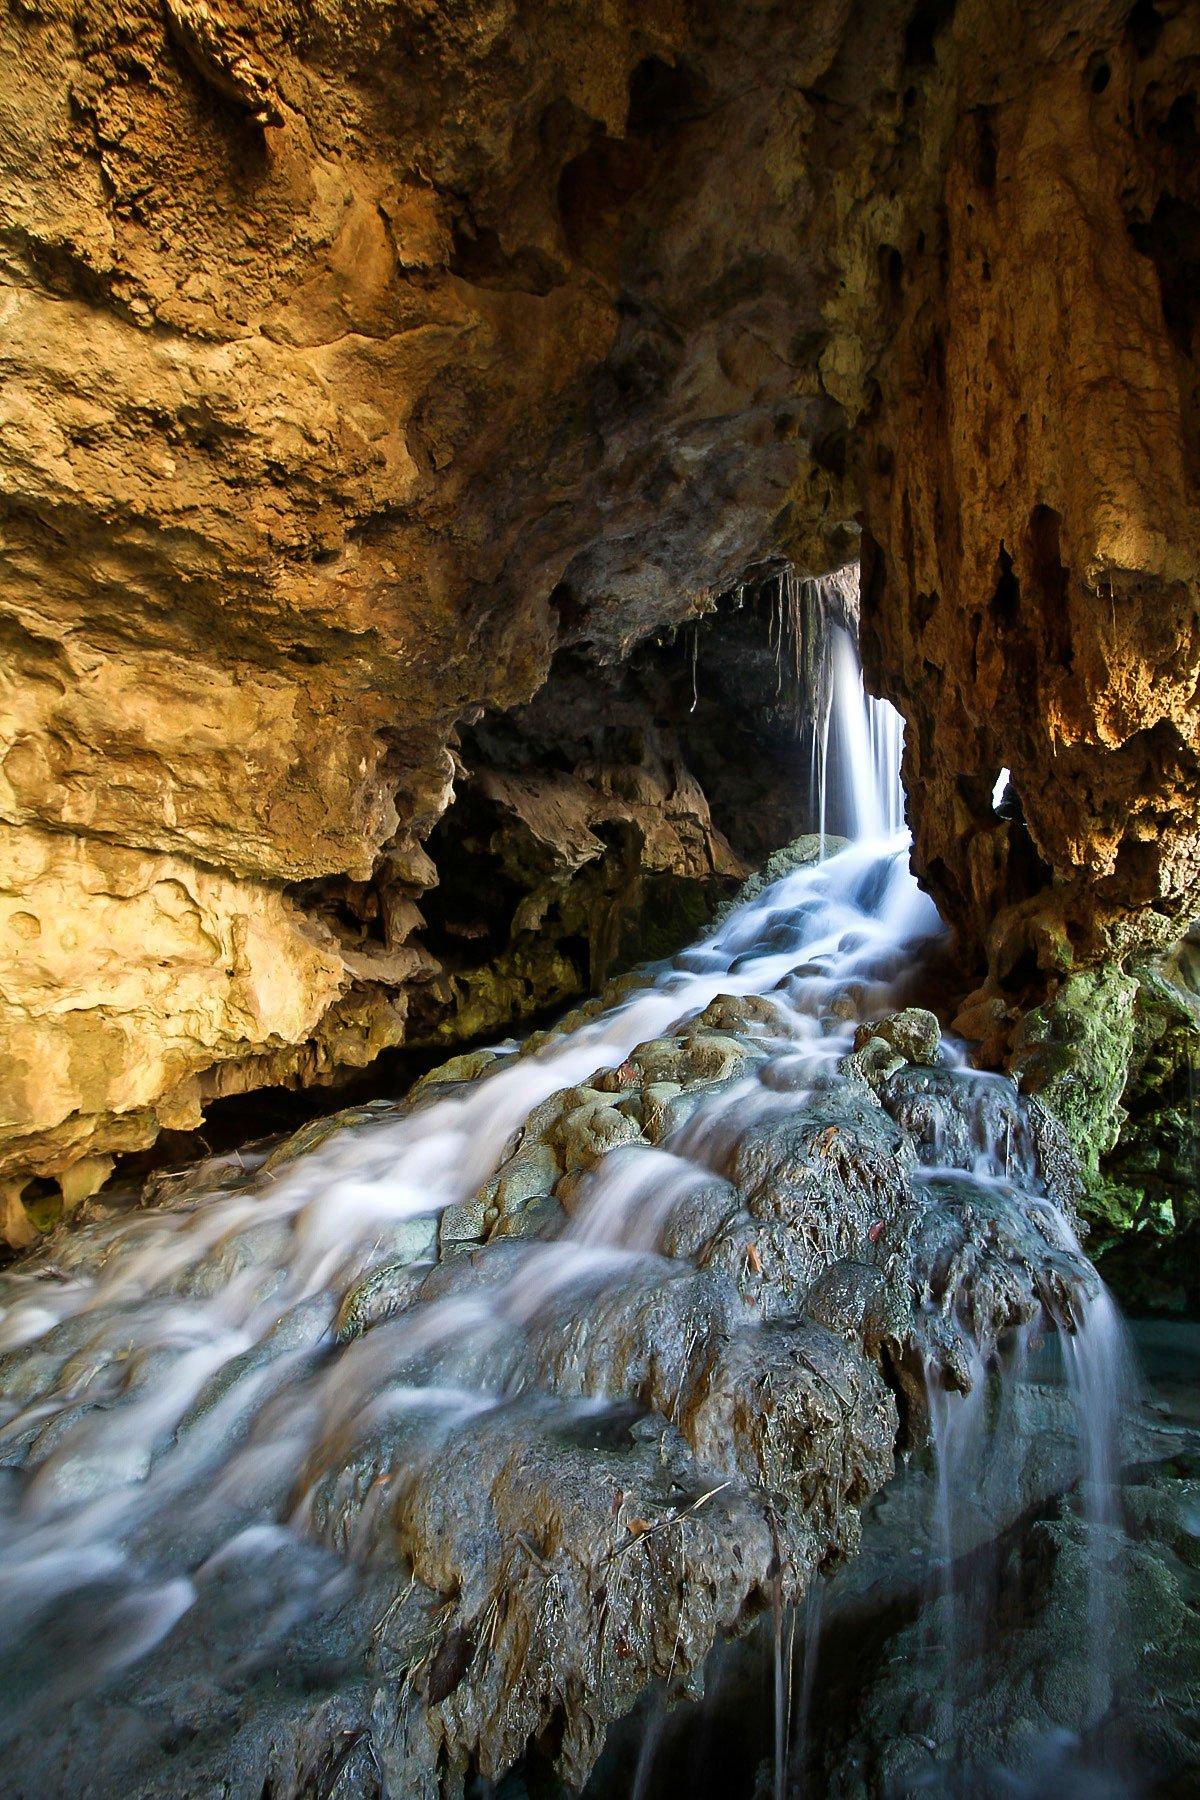 Marvel at Subterranean Calcium Travertines in Kaklik Cave, Pamukkale, Turkey